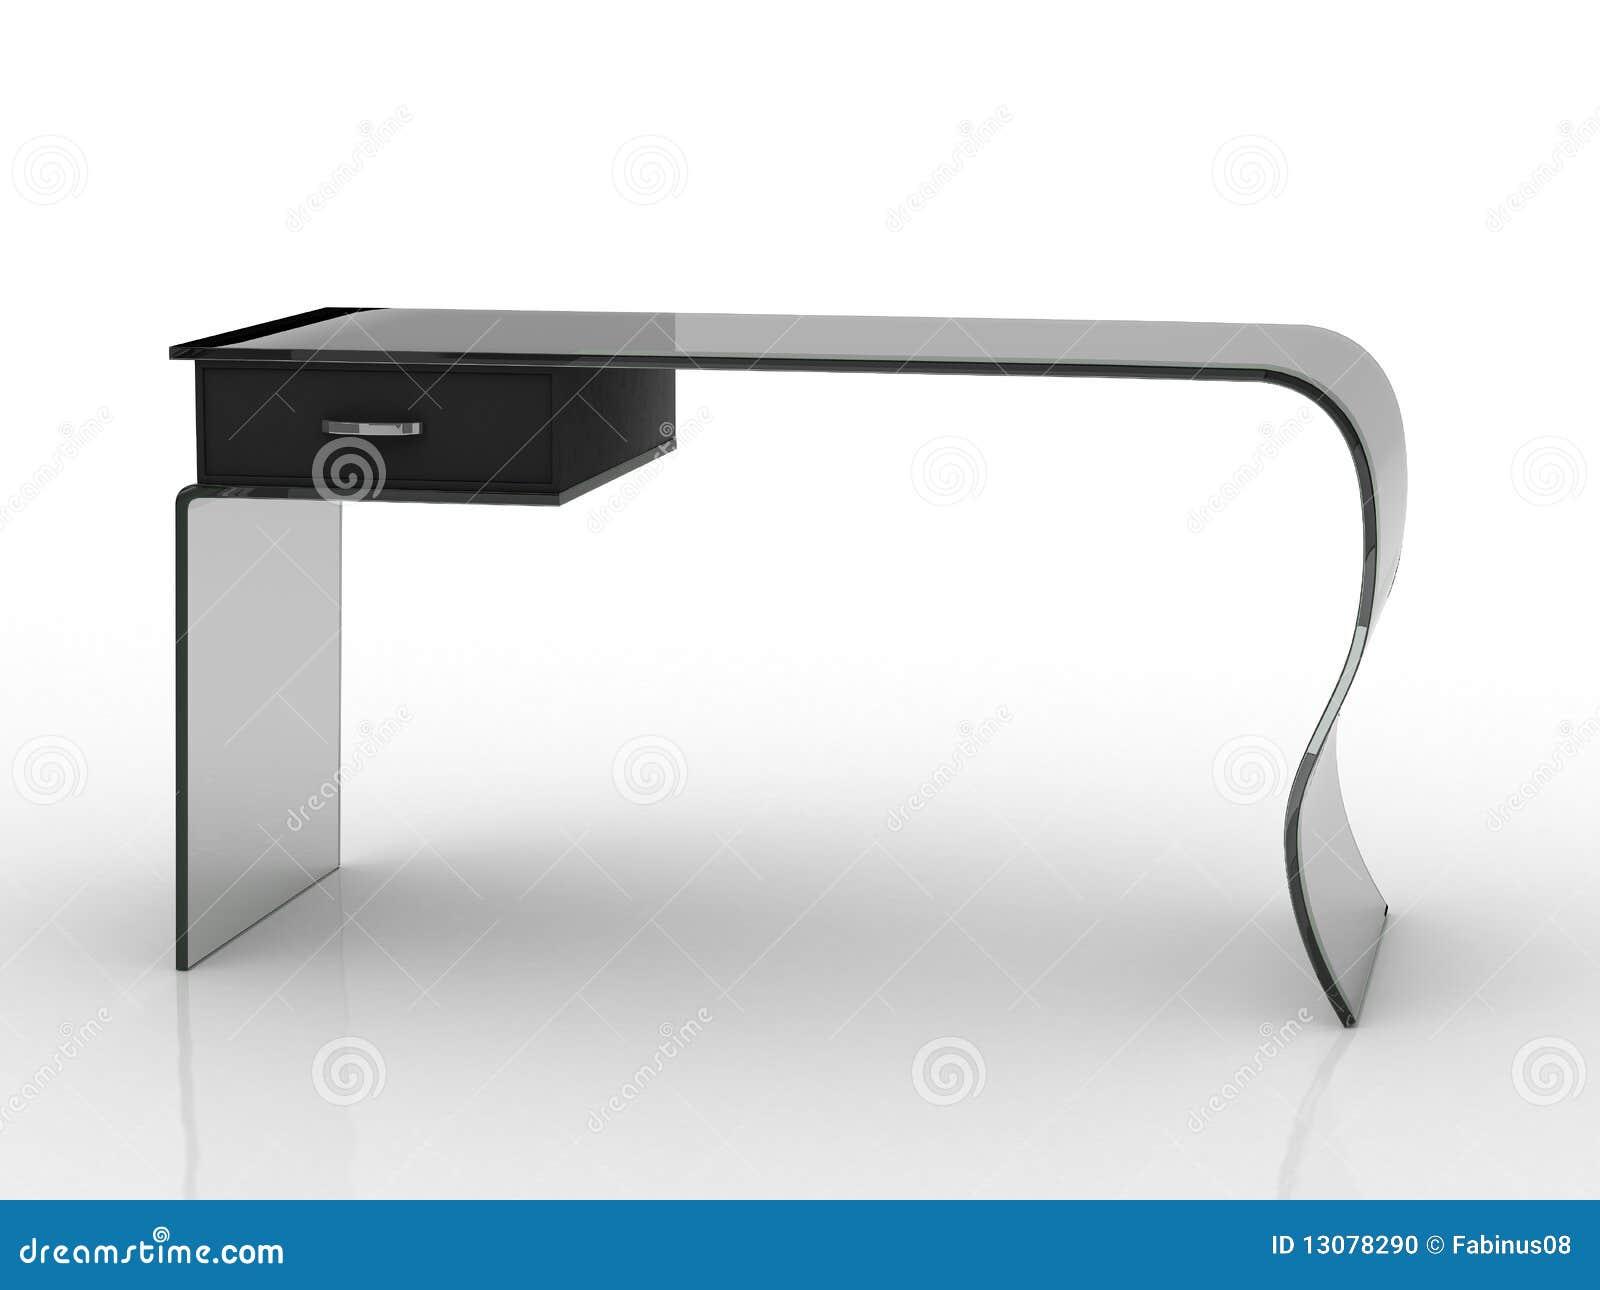 Escritorio de oficina con estilo moderno foto de archivo for Escritorio moderno blanco